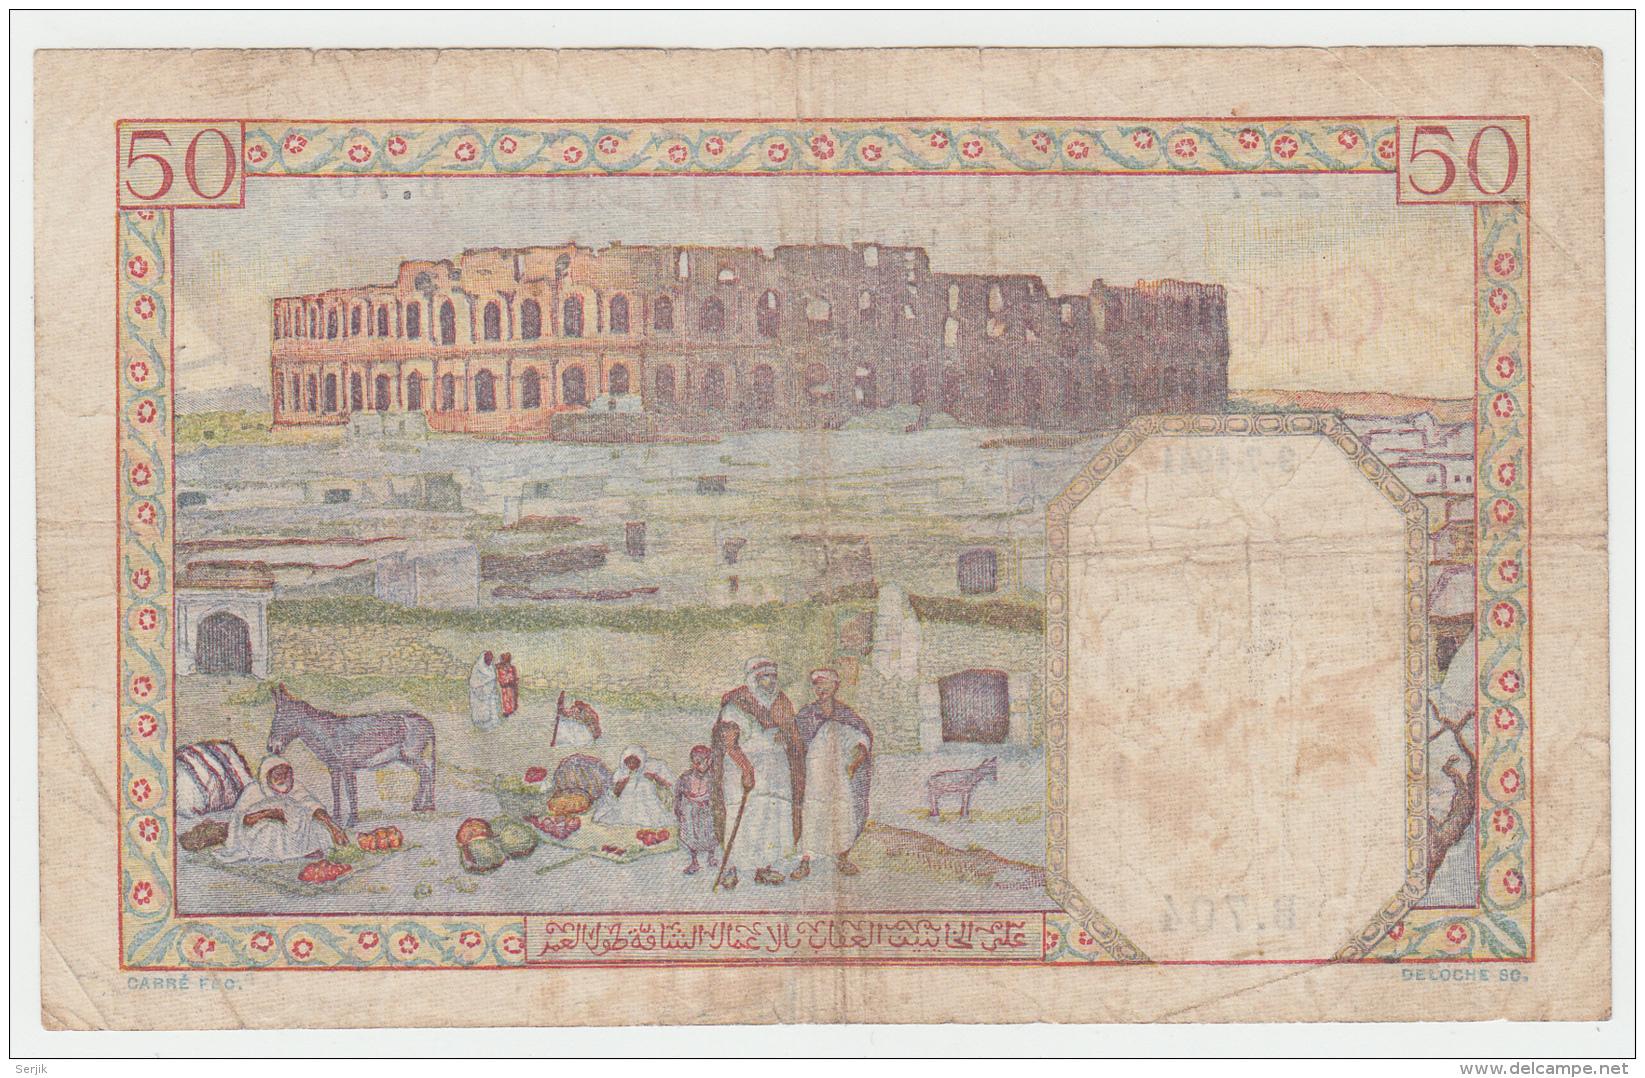 Tunisia Tunisie 50 Francs 1941 VG Pick 12 - Tunisia